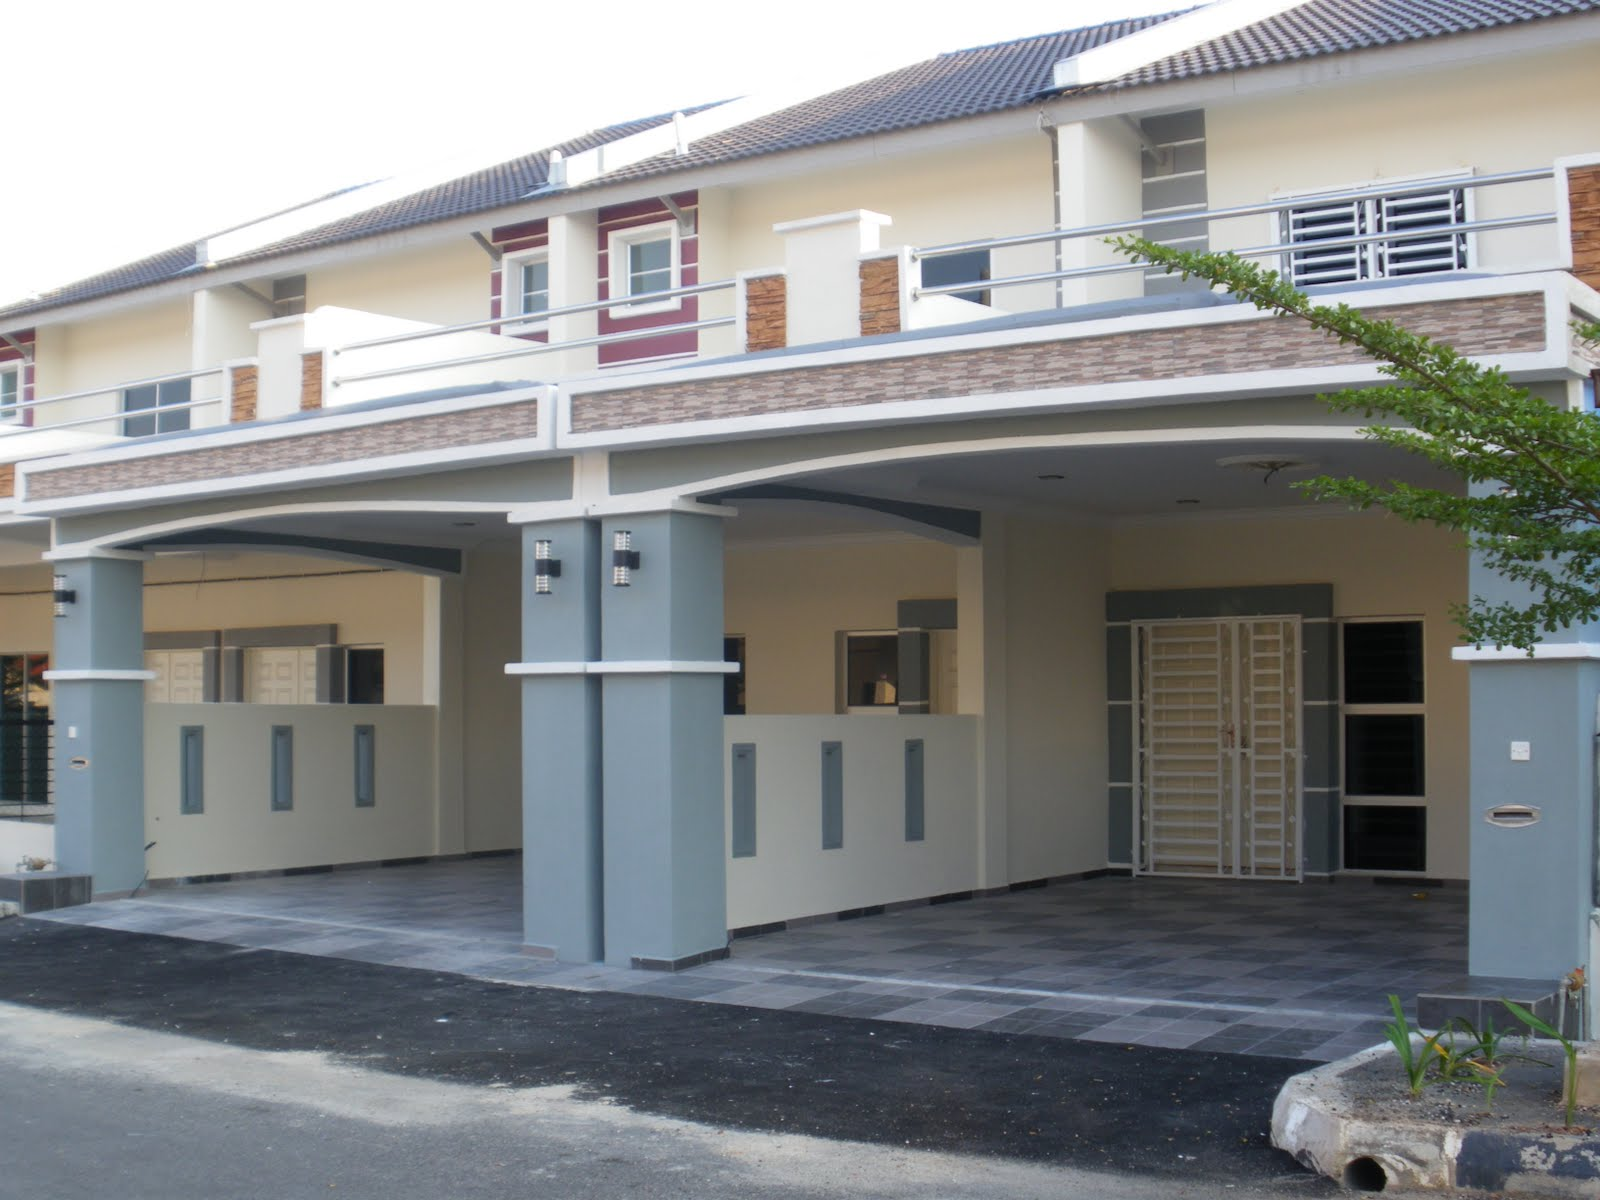 Kitchen car porch extension for Porch tiles designs for houses